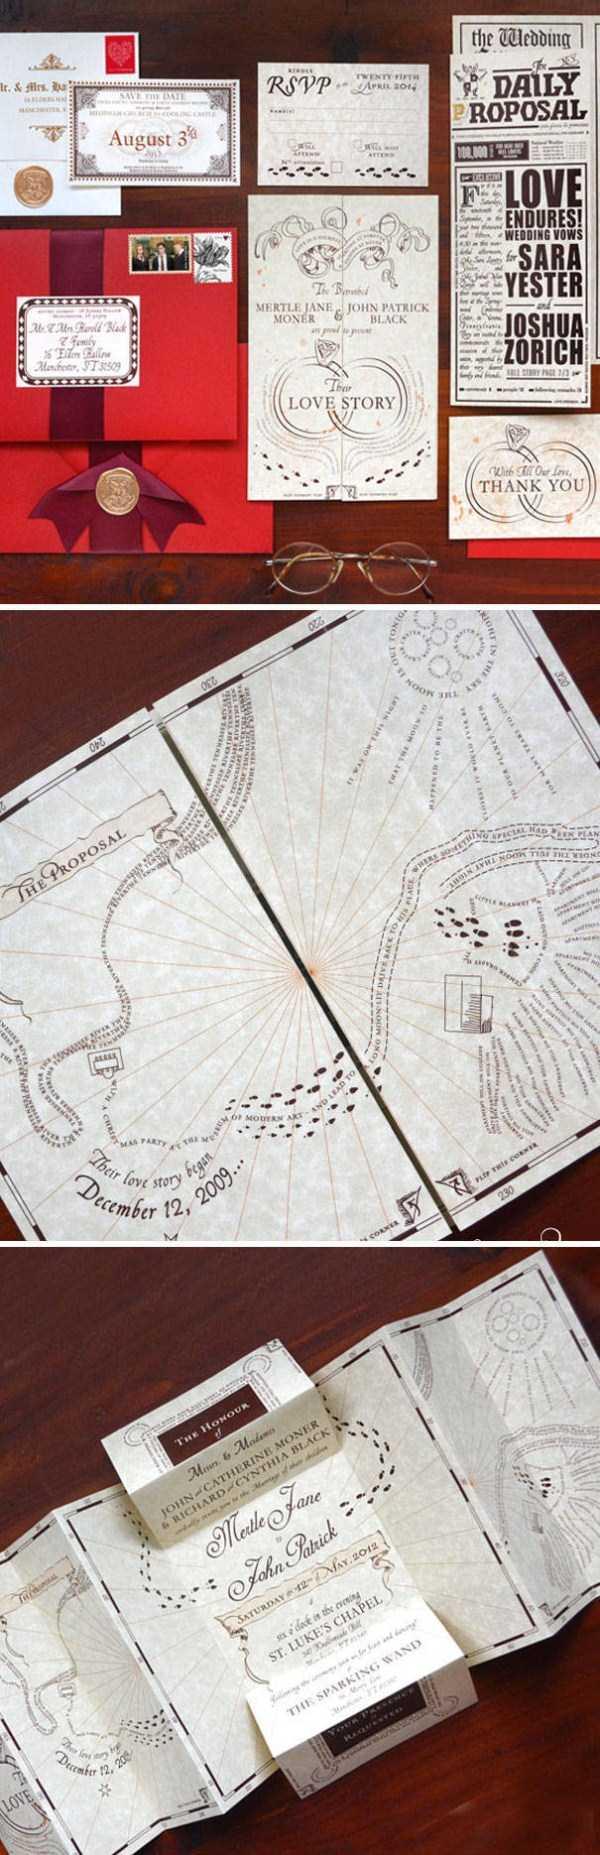 creative-wedding-invitations (30)